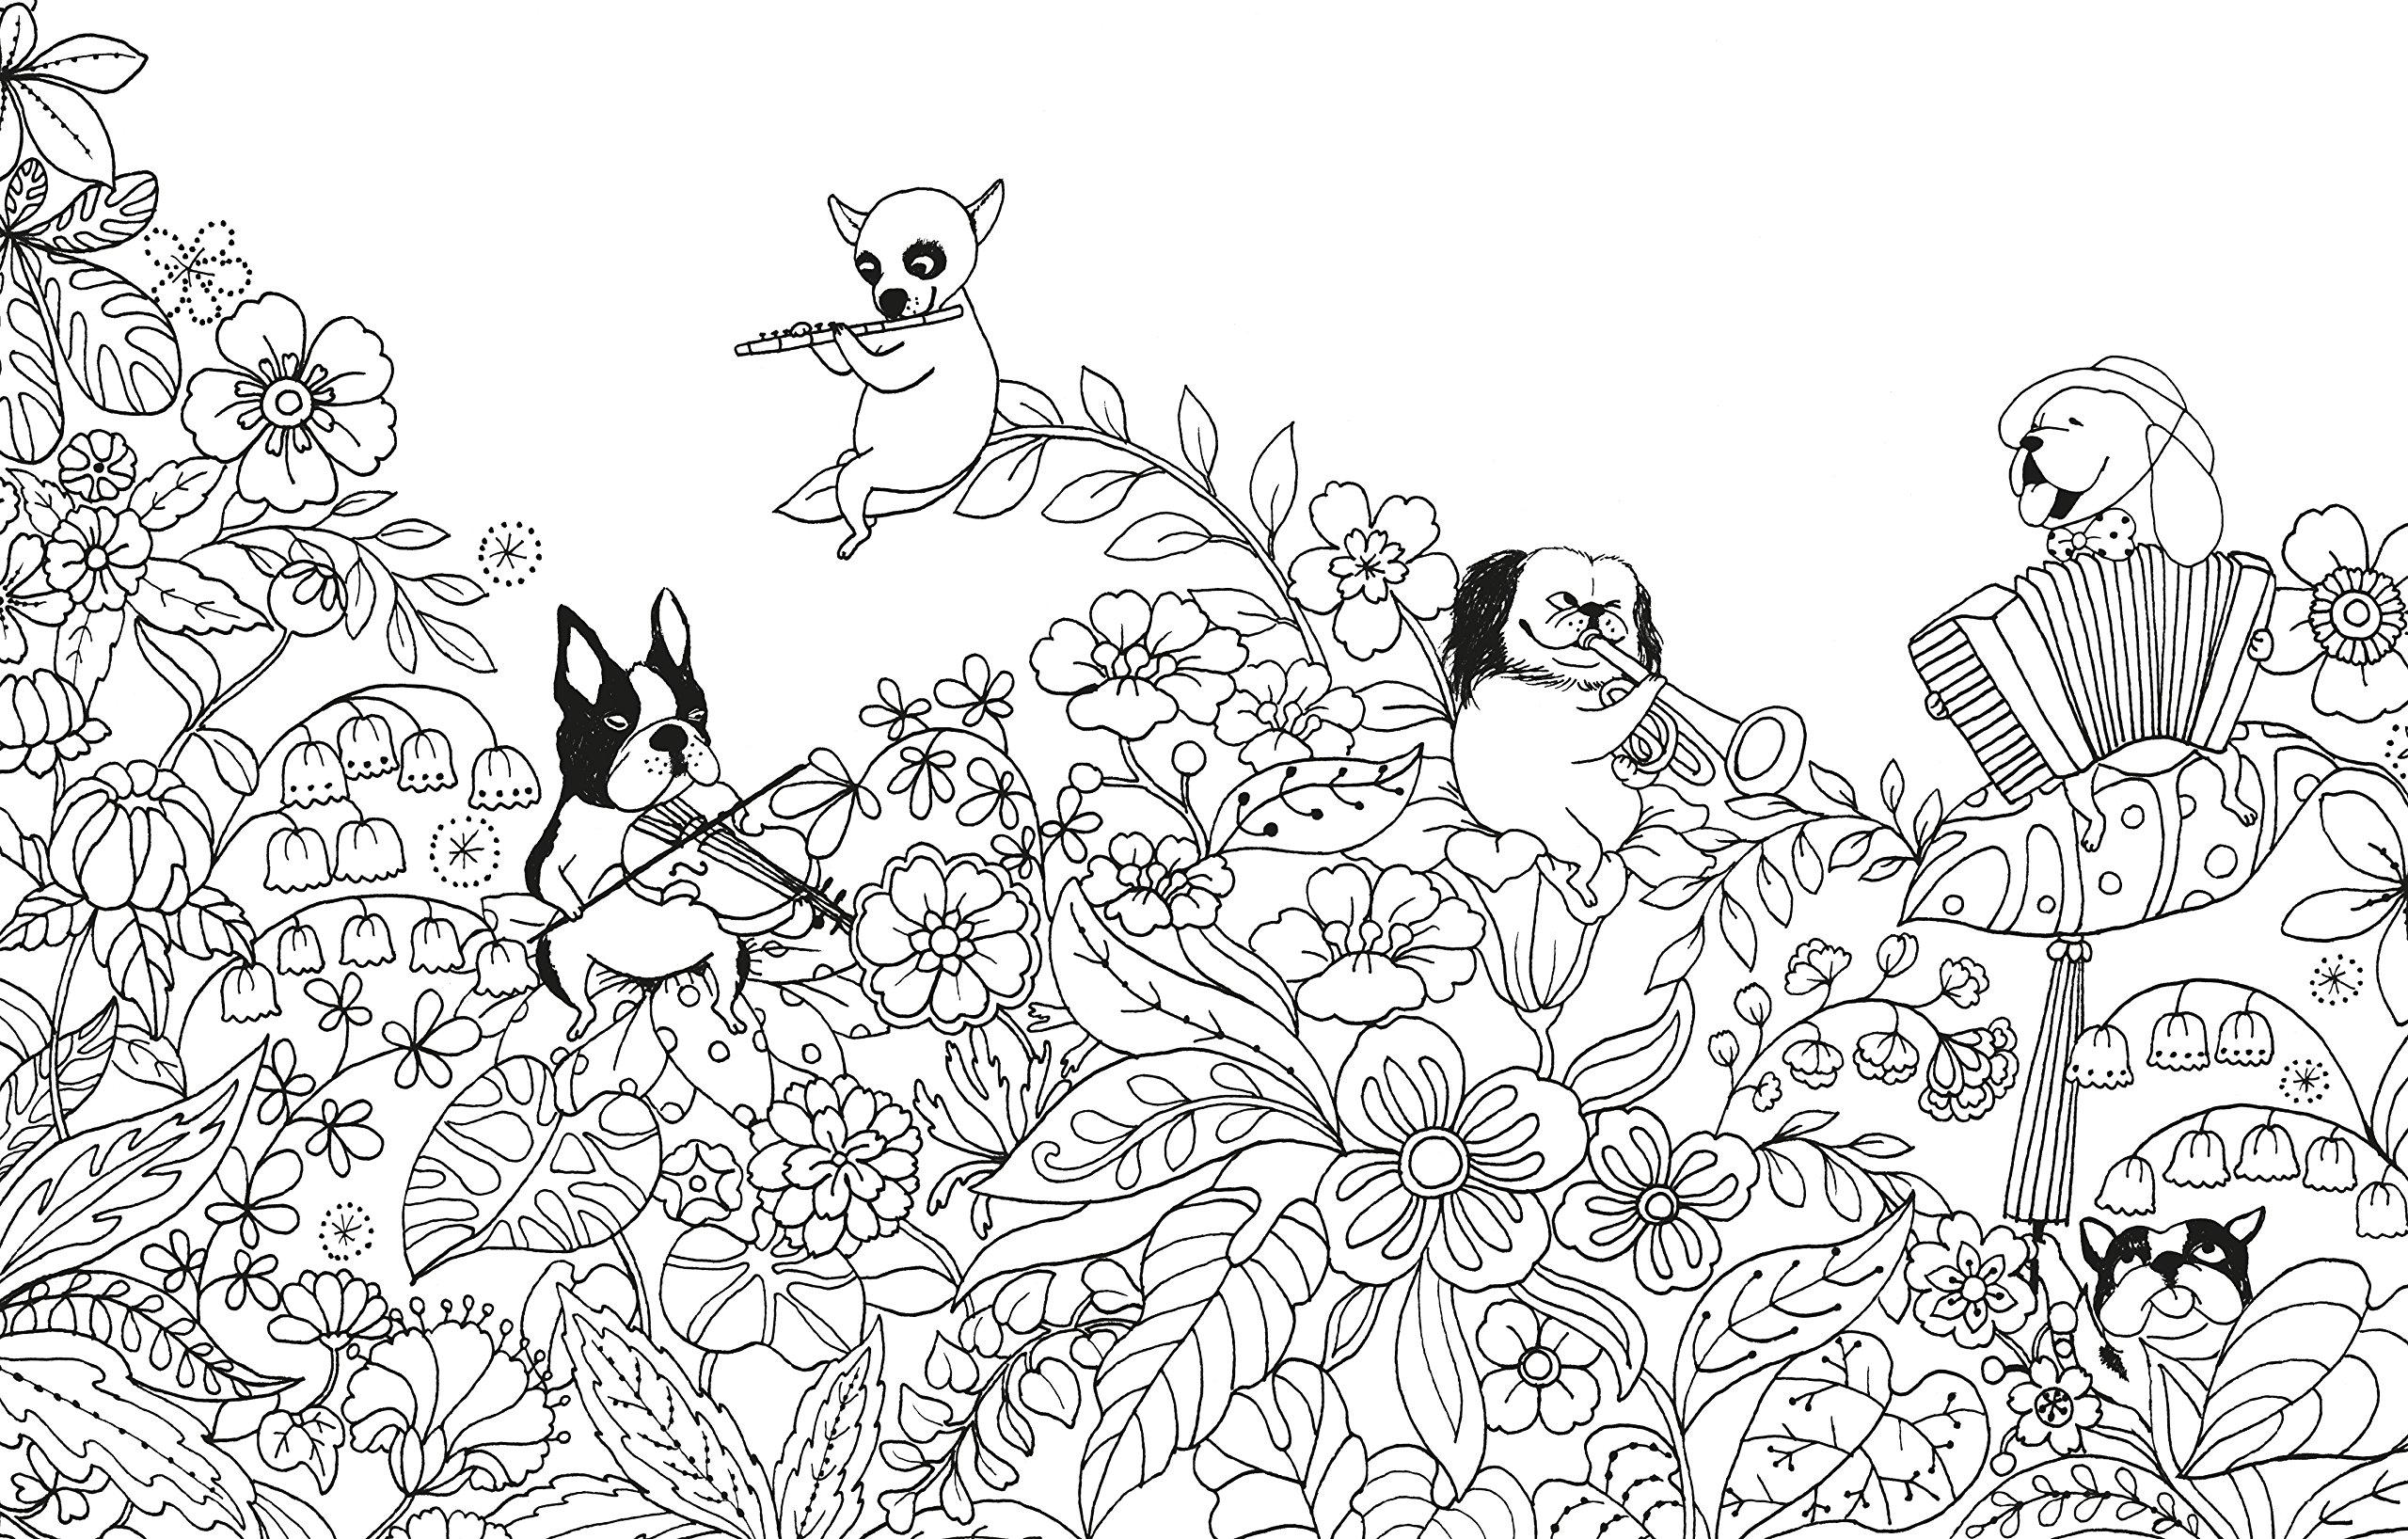 Un Millón De Perros Cachorros Adorables Para Colorear Libro De